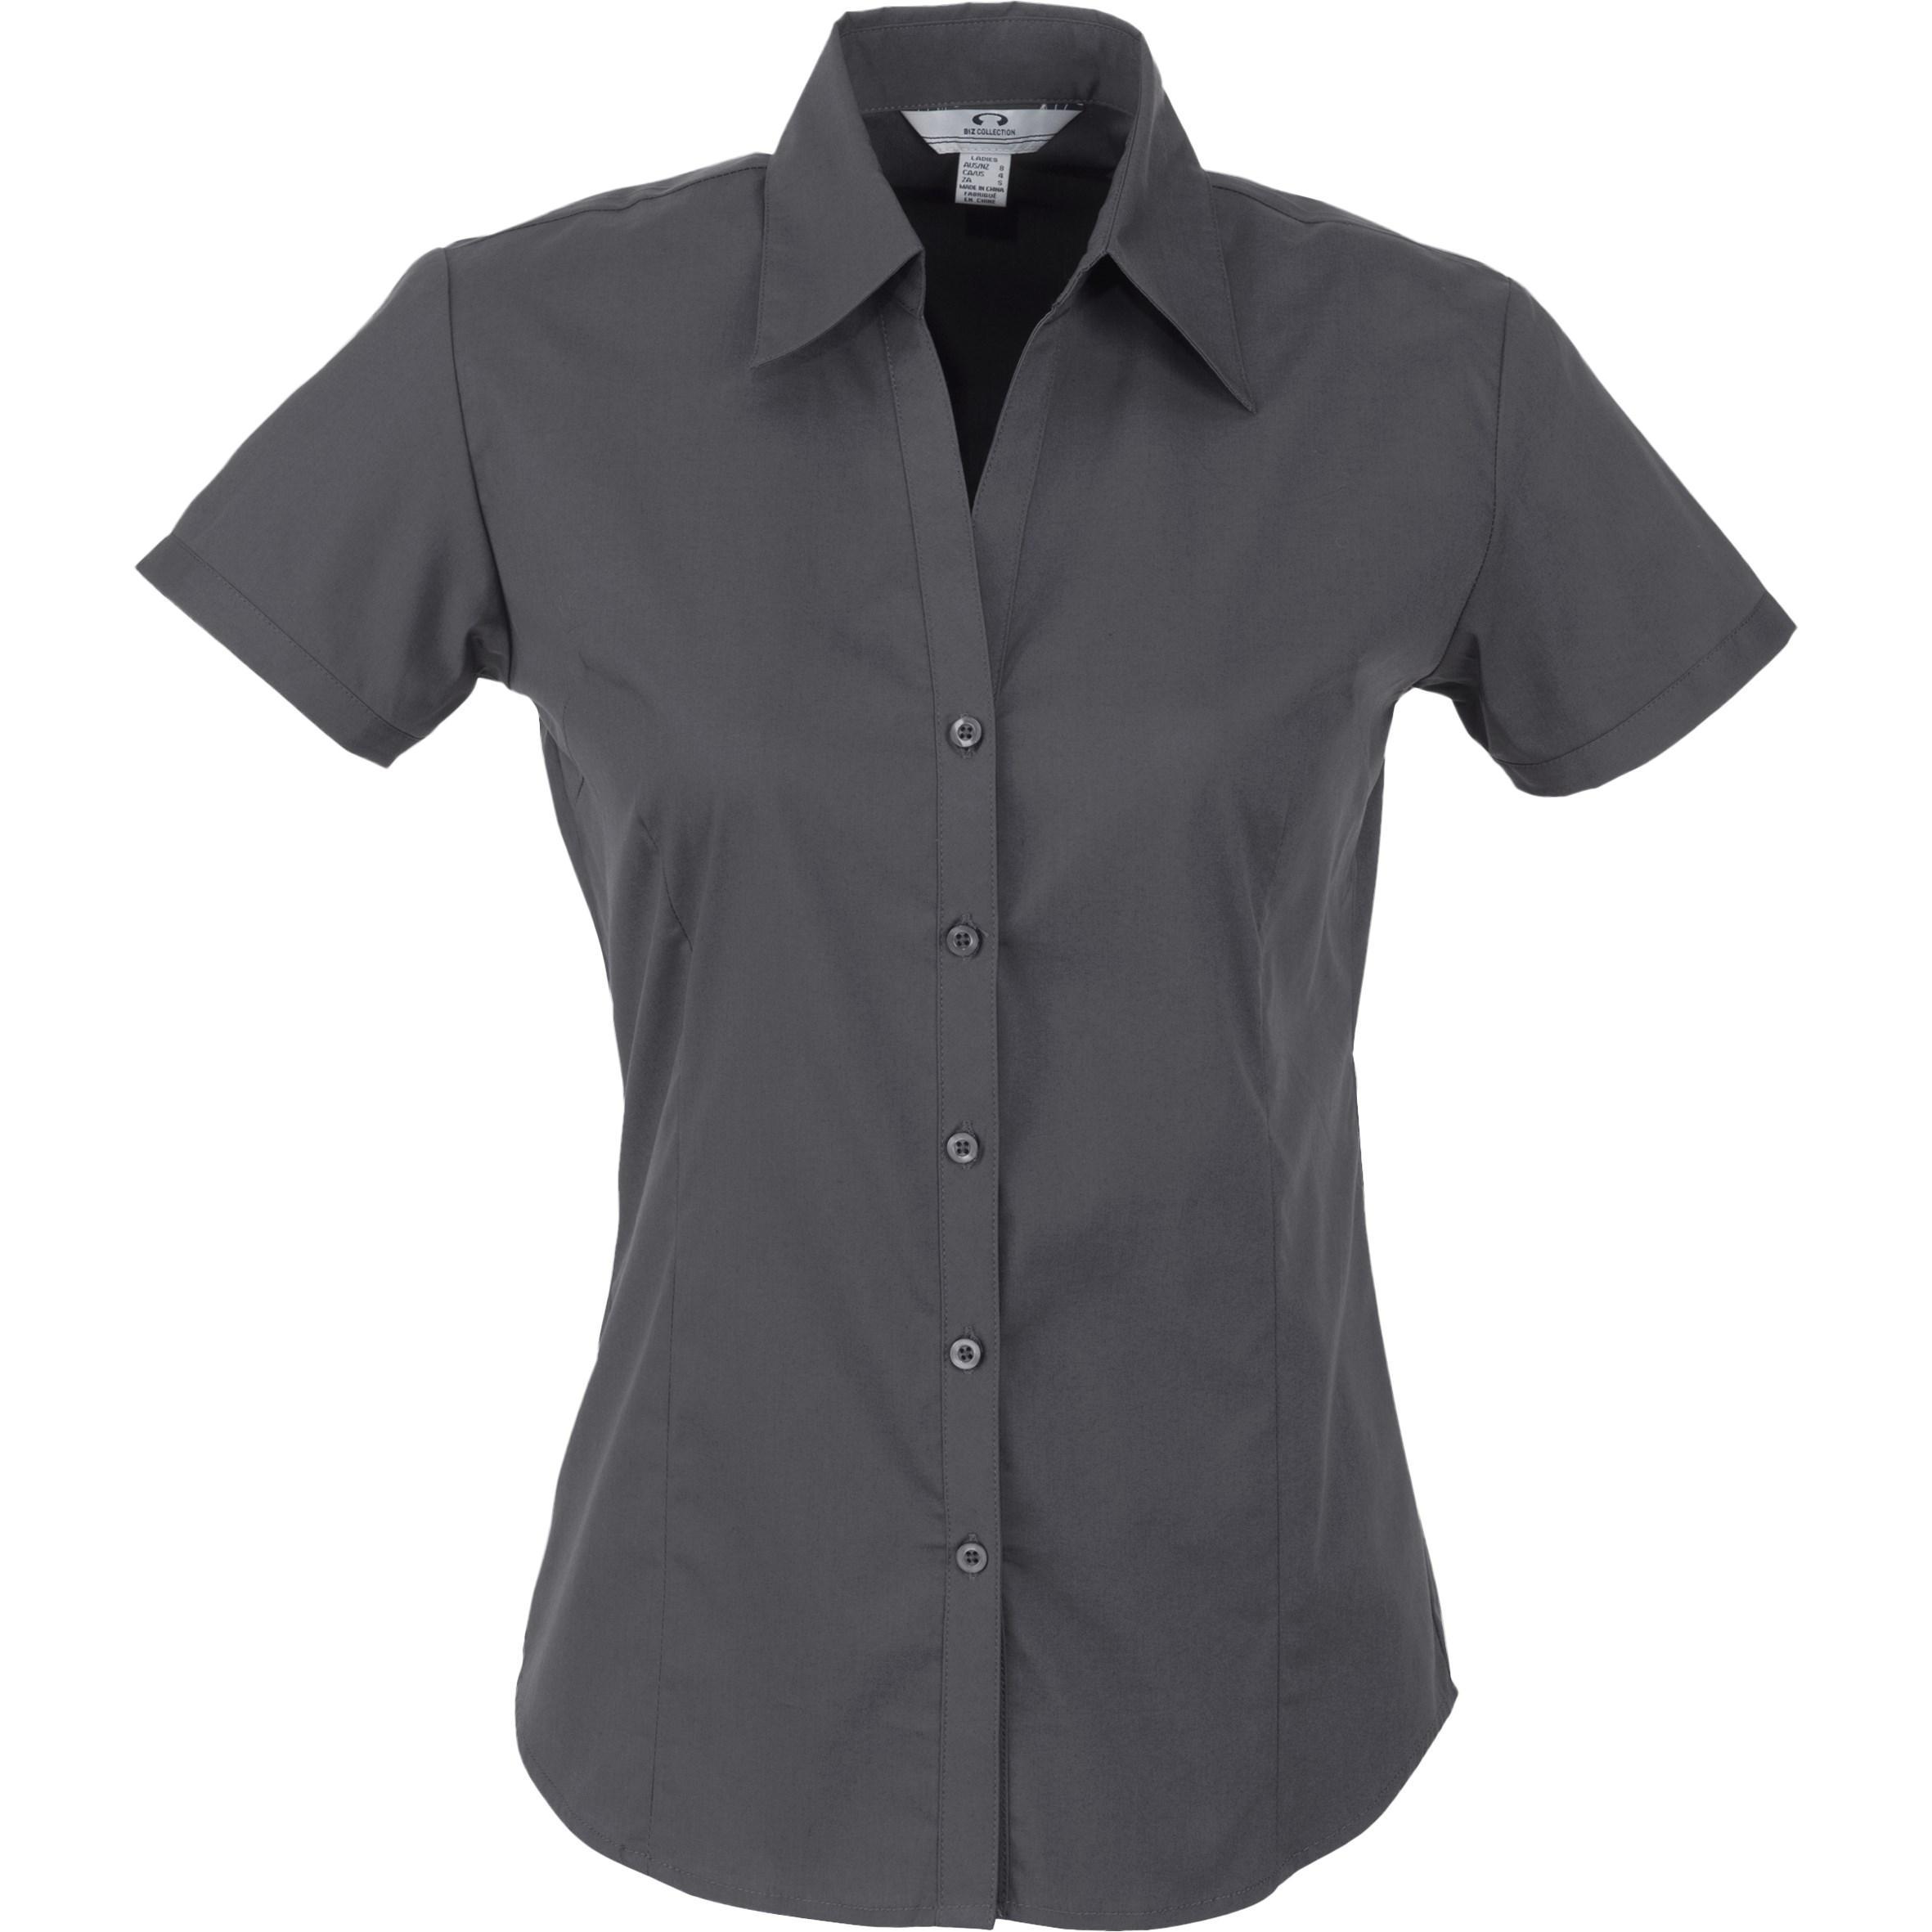 Ladies Short Sleeve Metro Shirt - Grey Only